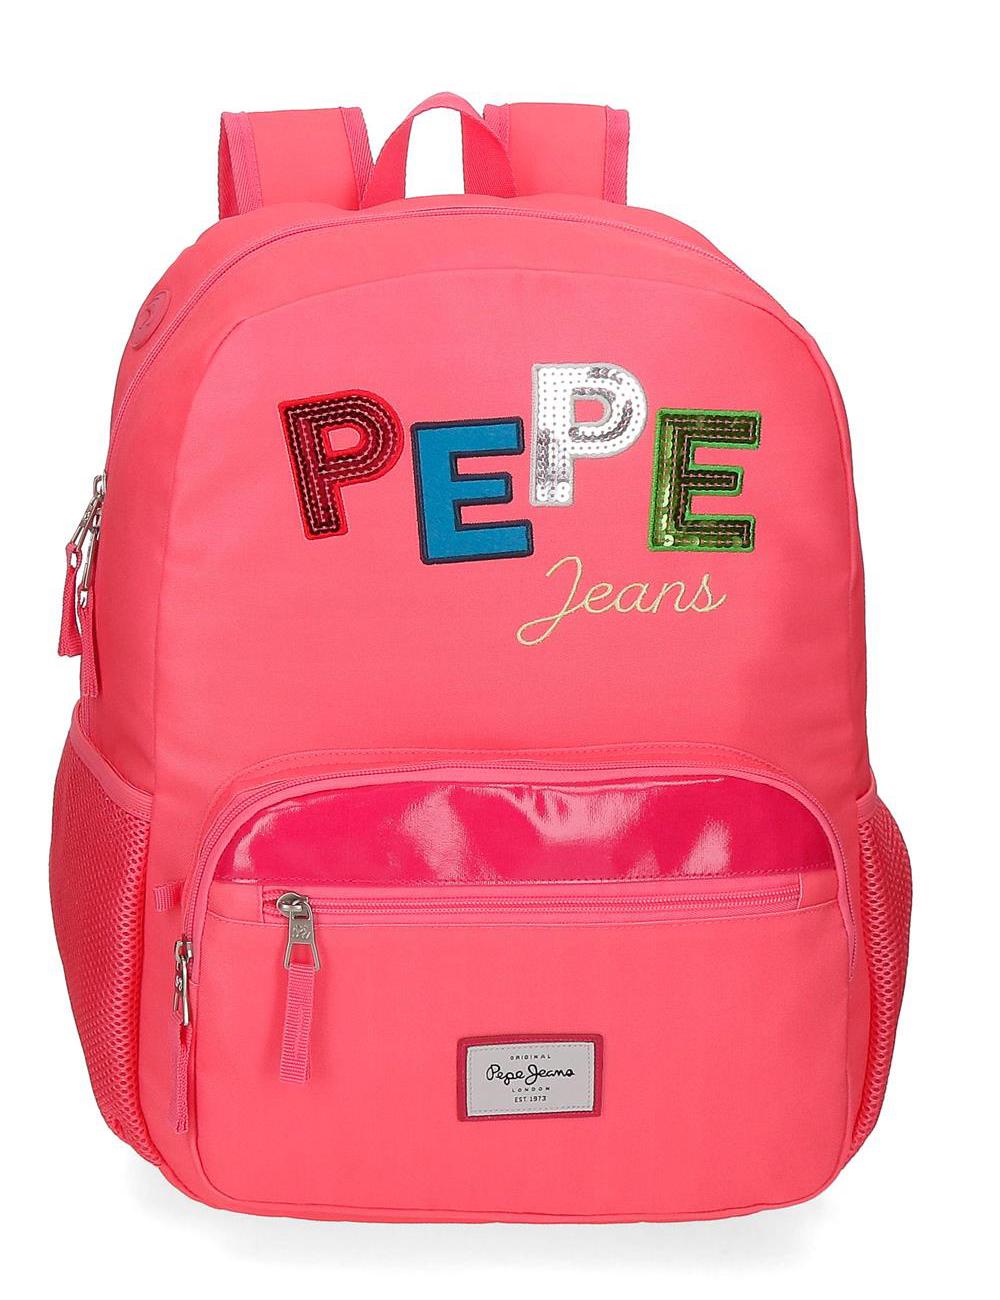 6212321 Mochila Porta Tablet 43 cm Pepe Jeans Kim Rosa